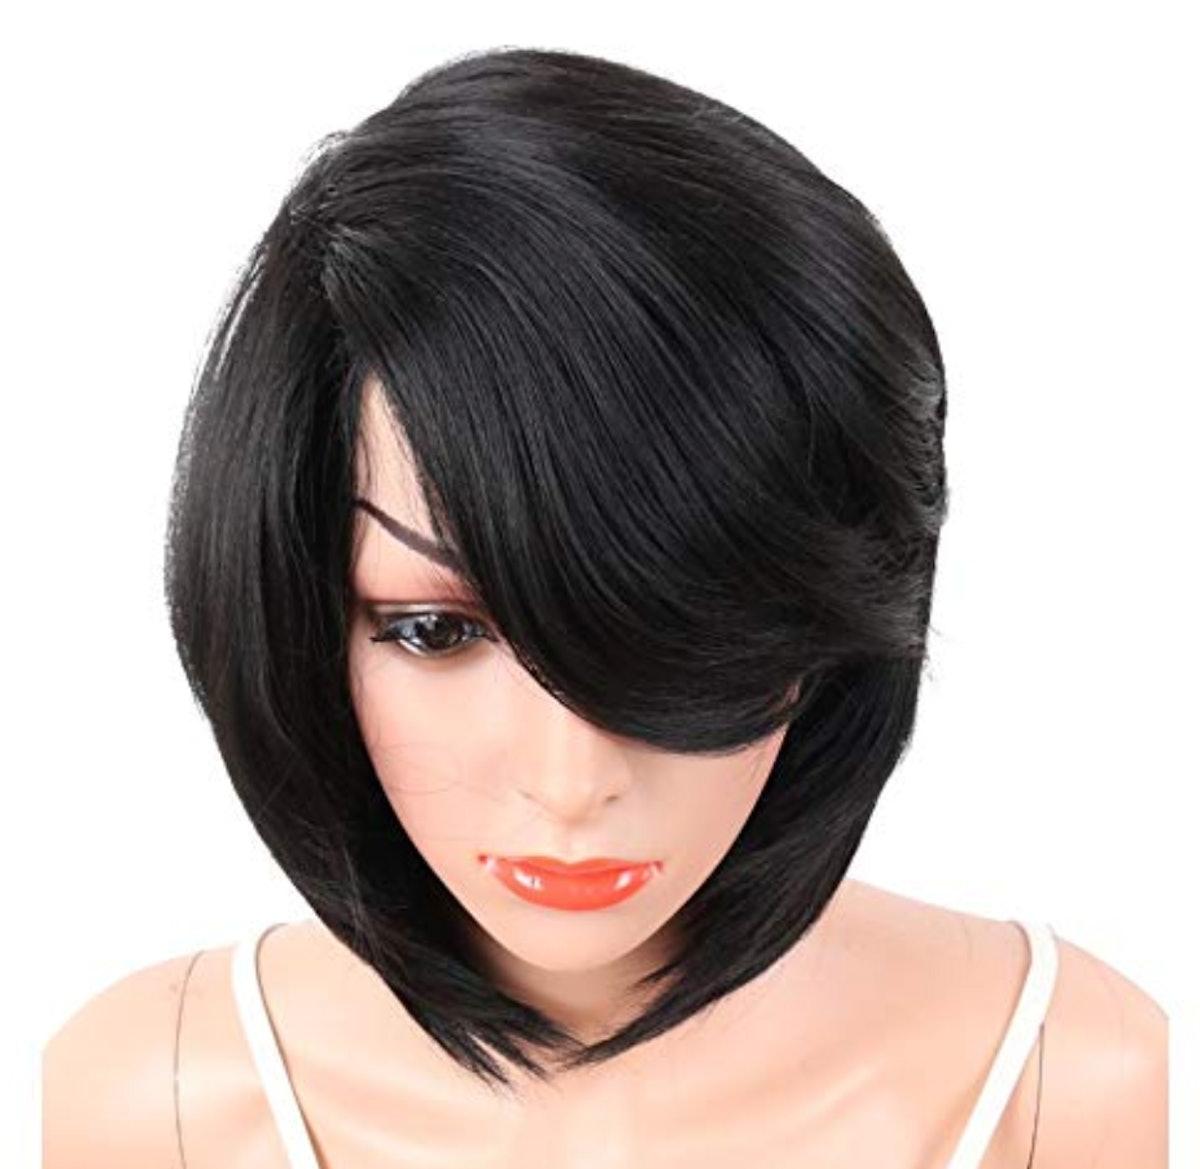 KRSI Short Pixie Cut Straight Bob Synthetic Wig